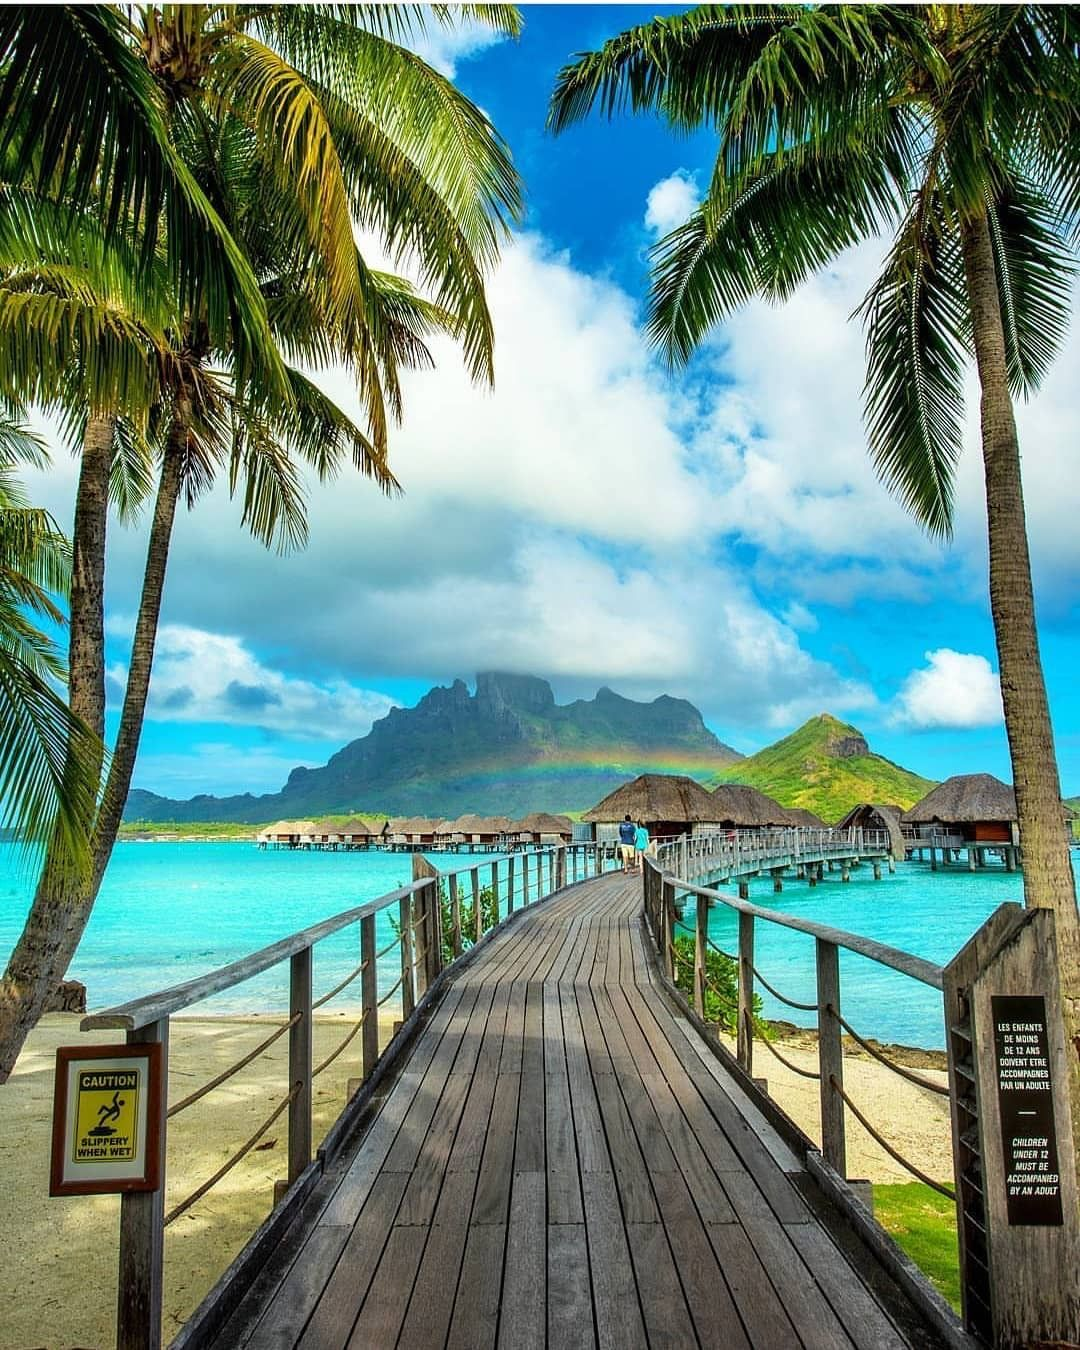 Bora Bora Combo Sunset Cruise Romantic Dinner Tempat Liburan Pemandangan Pantai